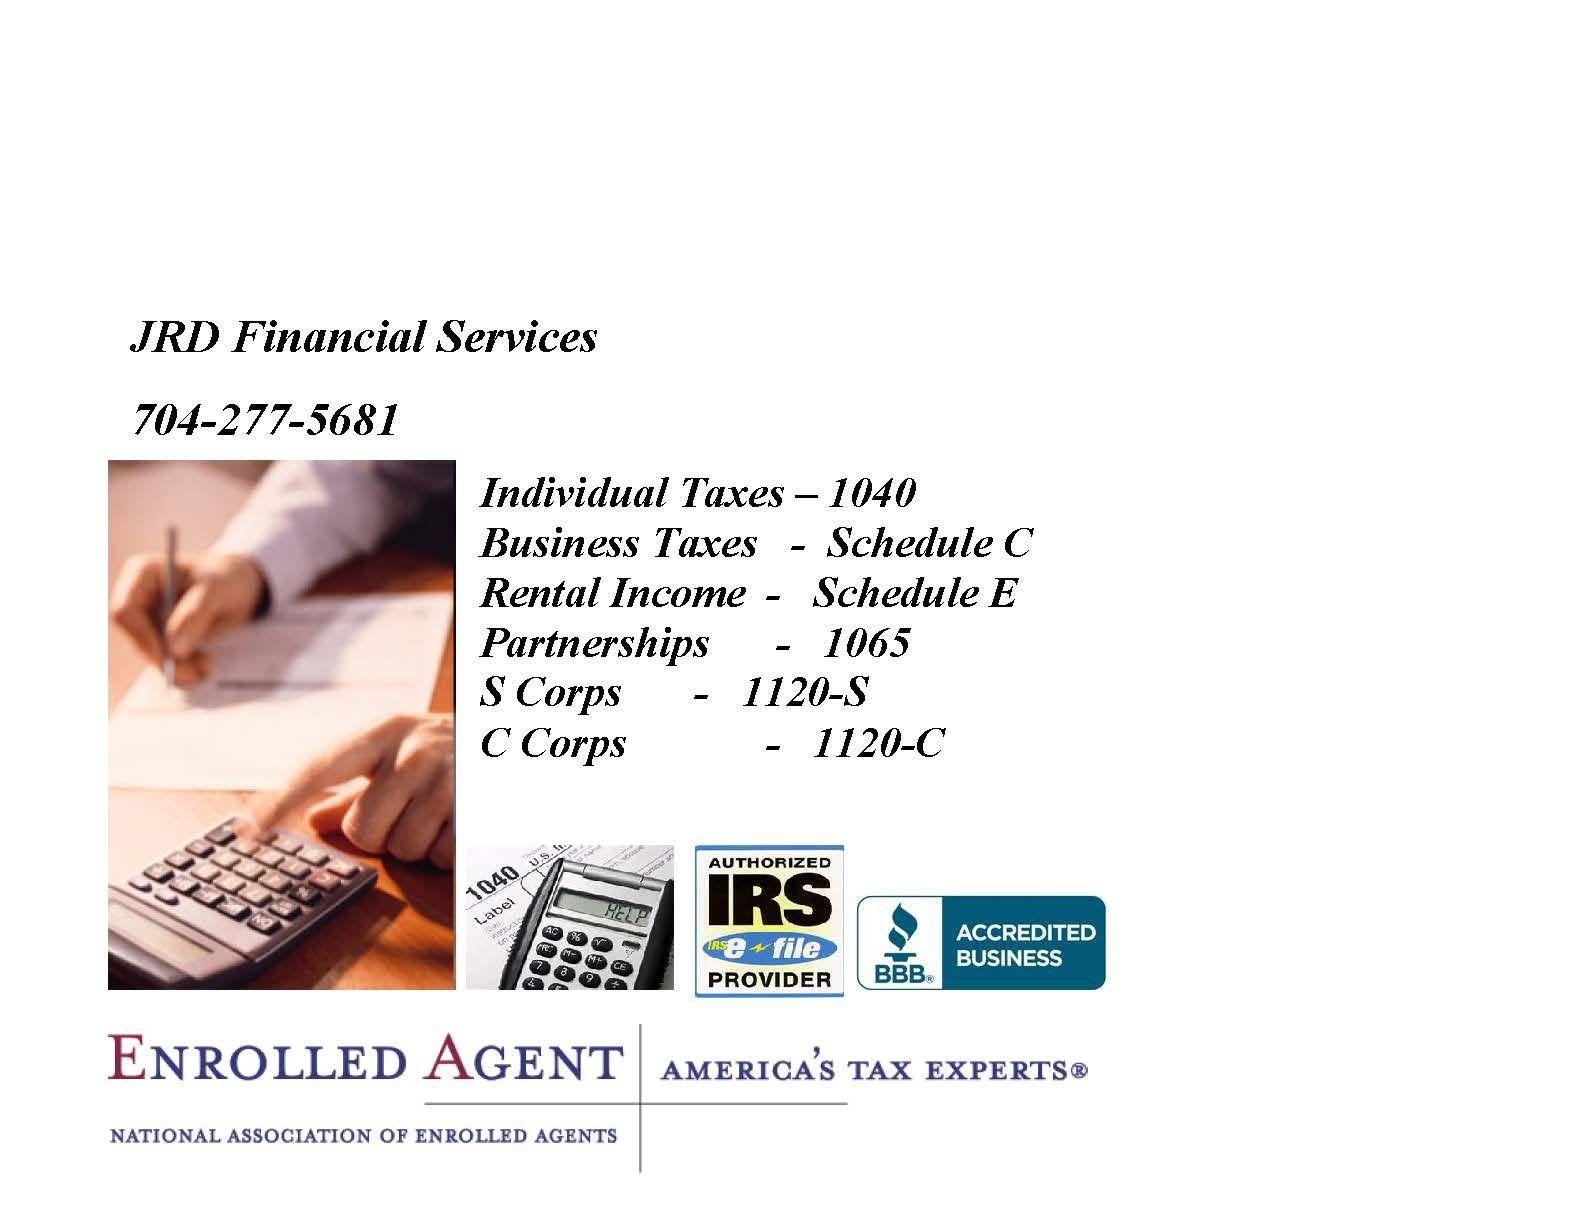 JRD Financial Services (2013 logoad (2) Business tax